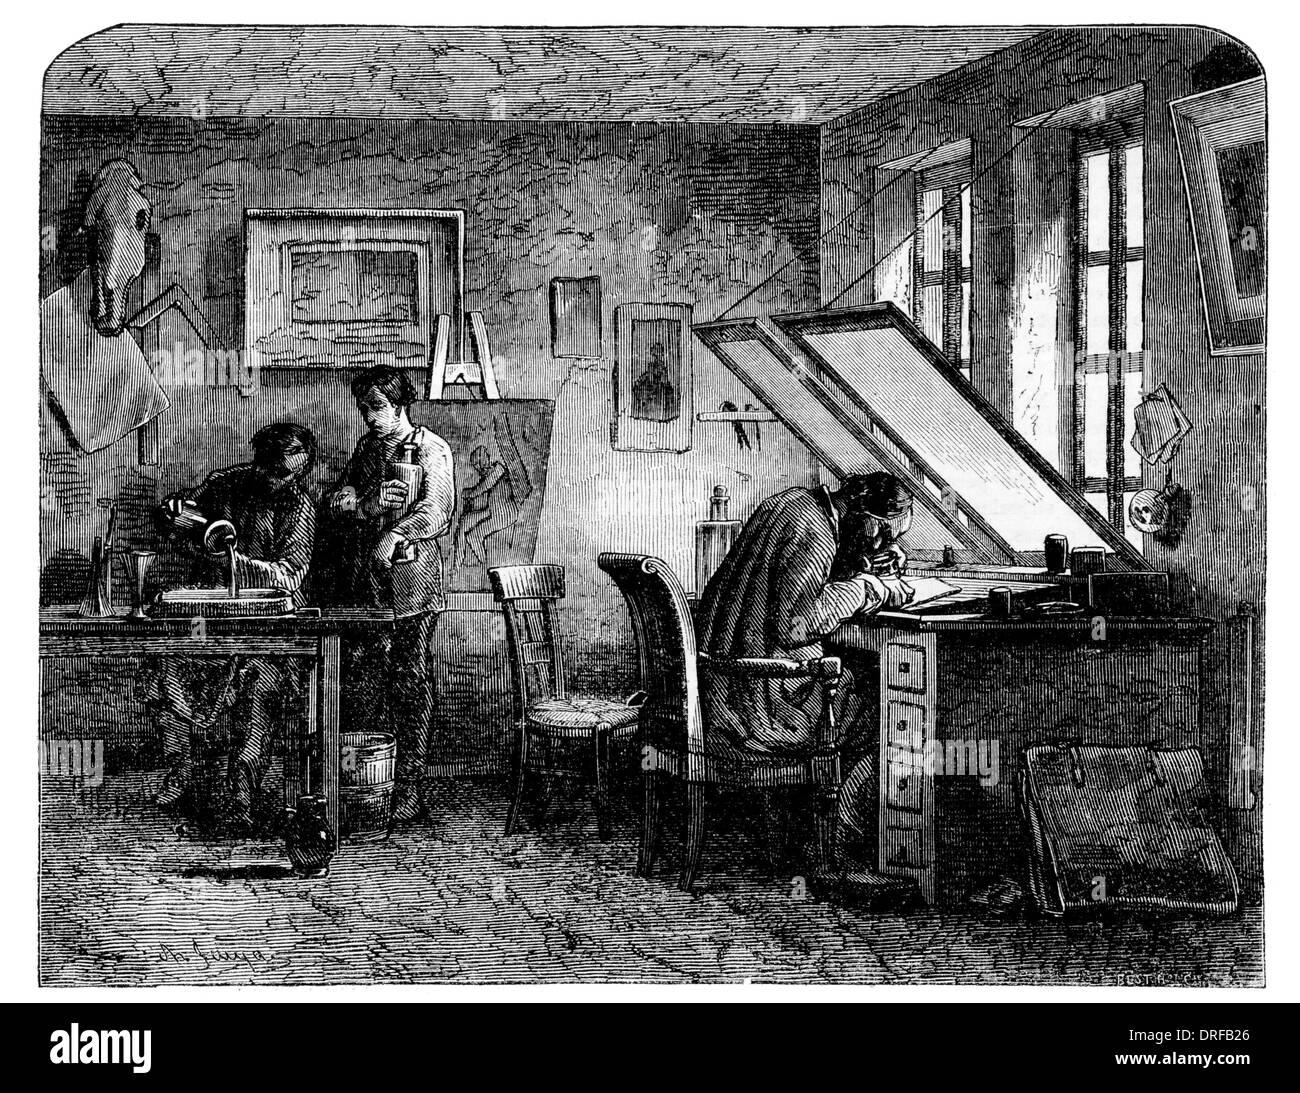 Engravers Workshop circa 1854 - Stock Image